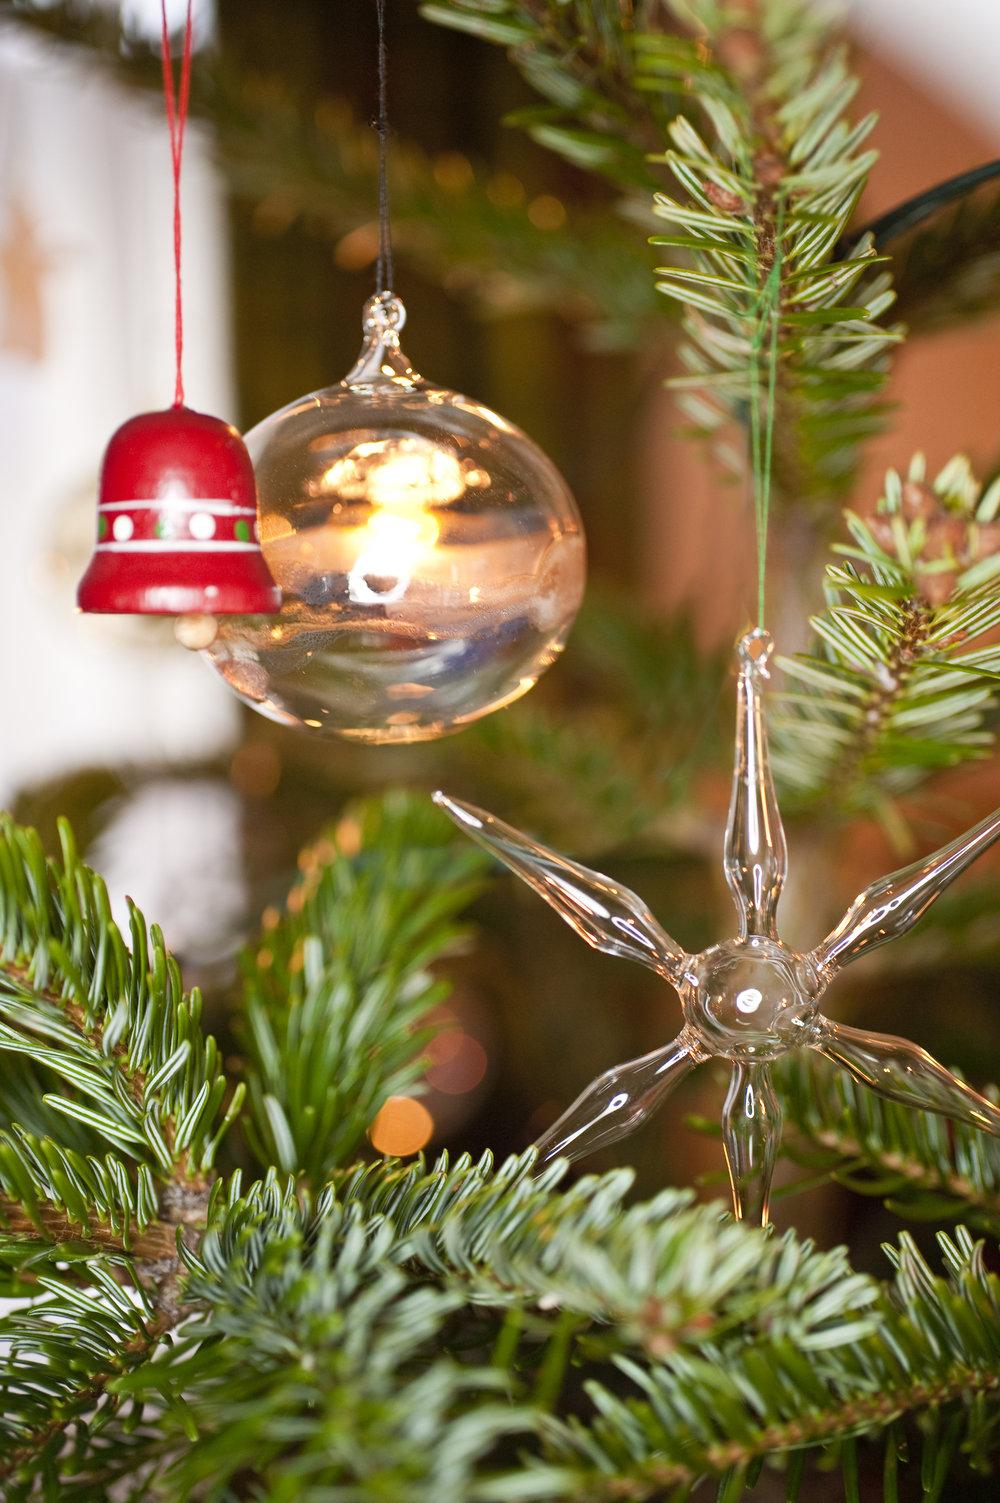 christmas-decoration_zybr-Vq_.jpg